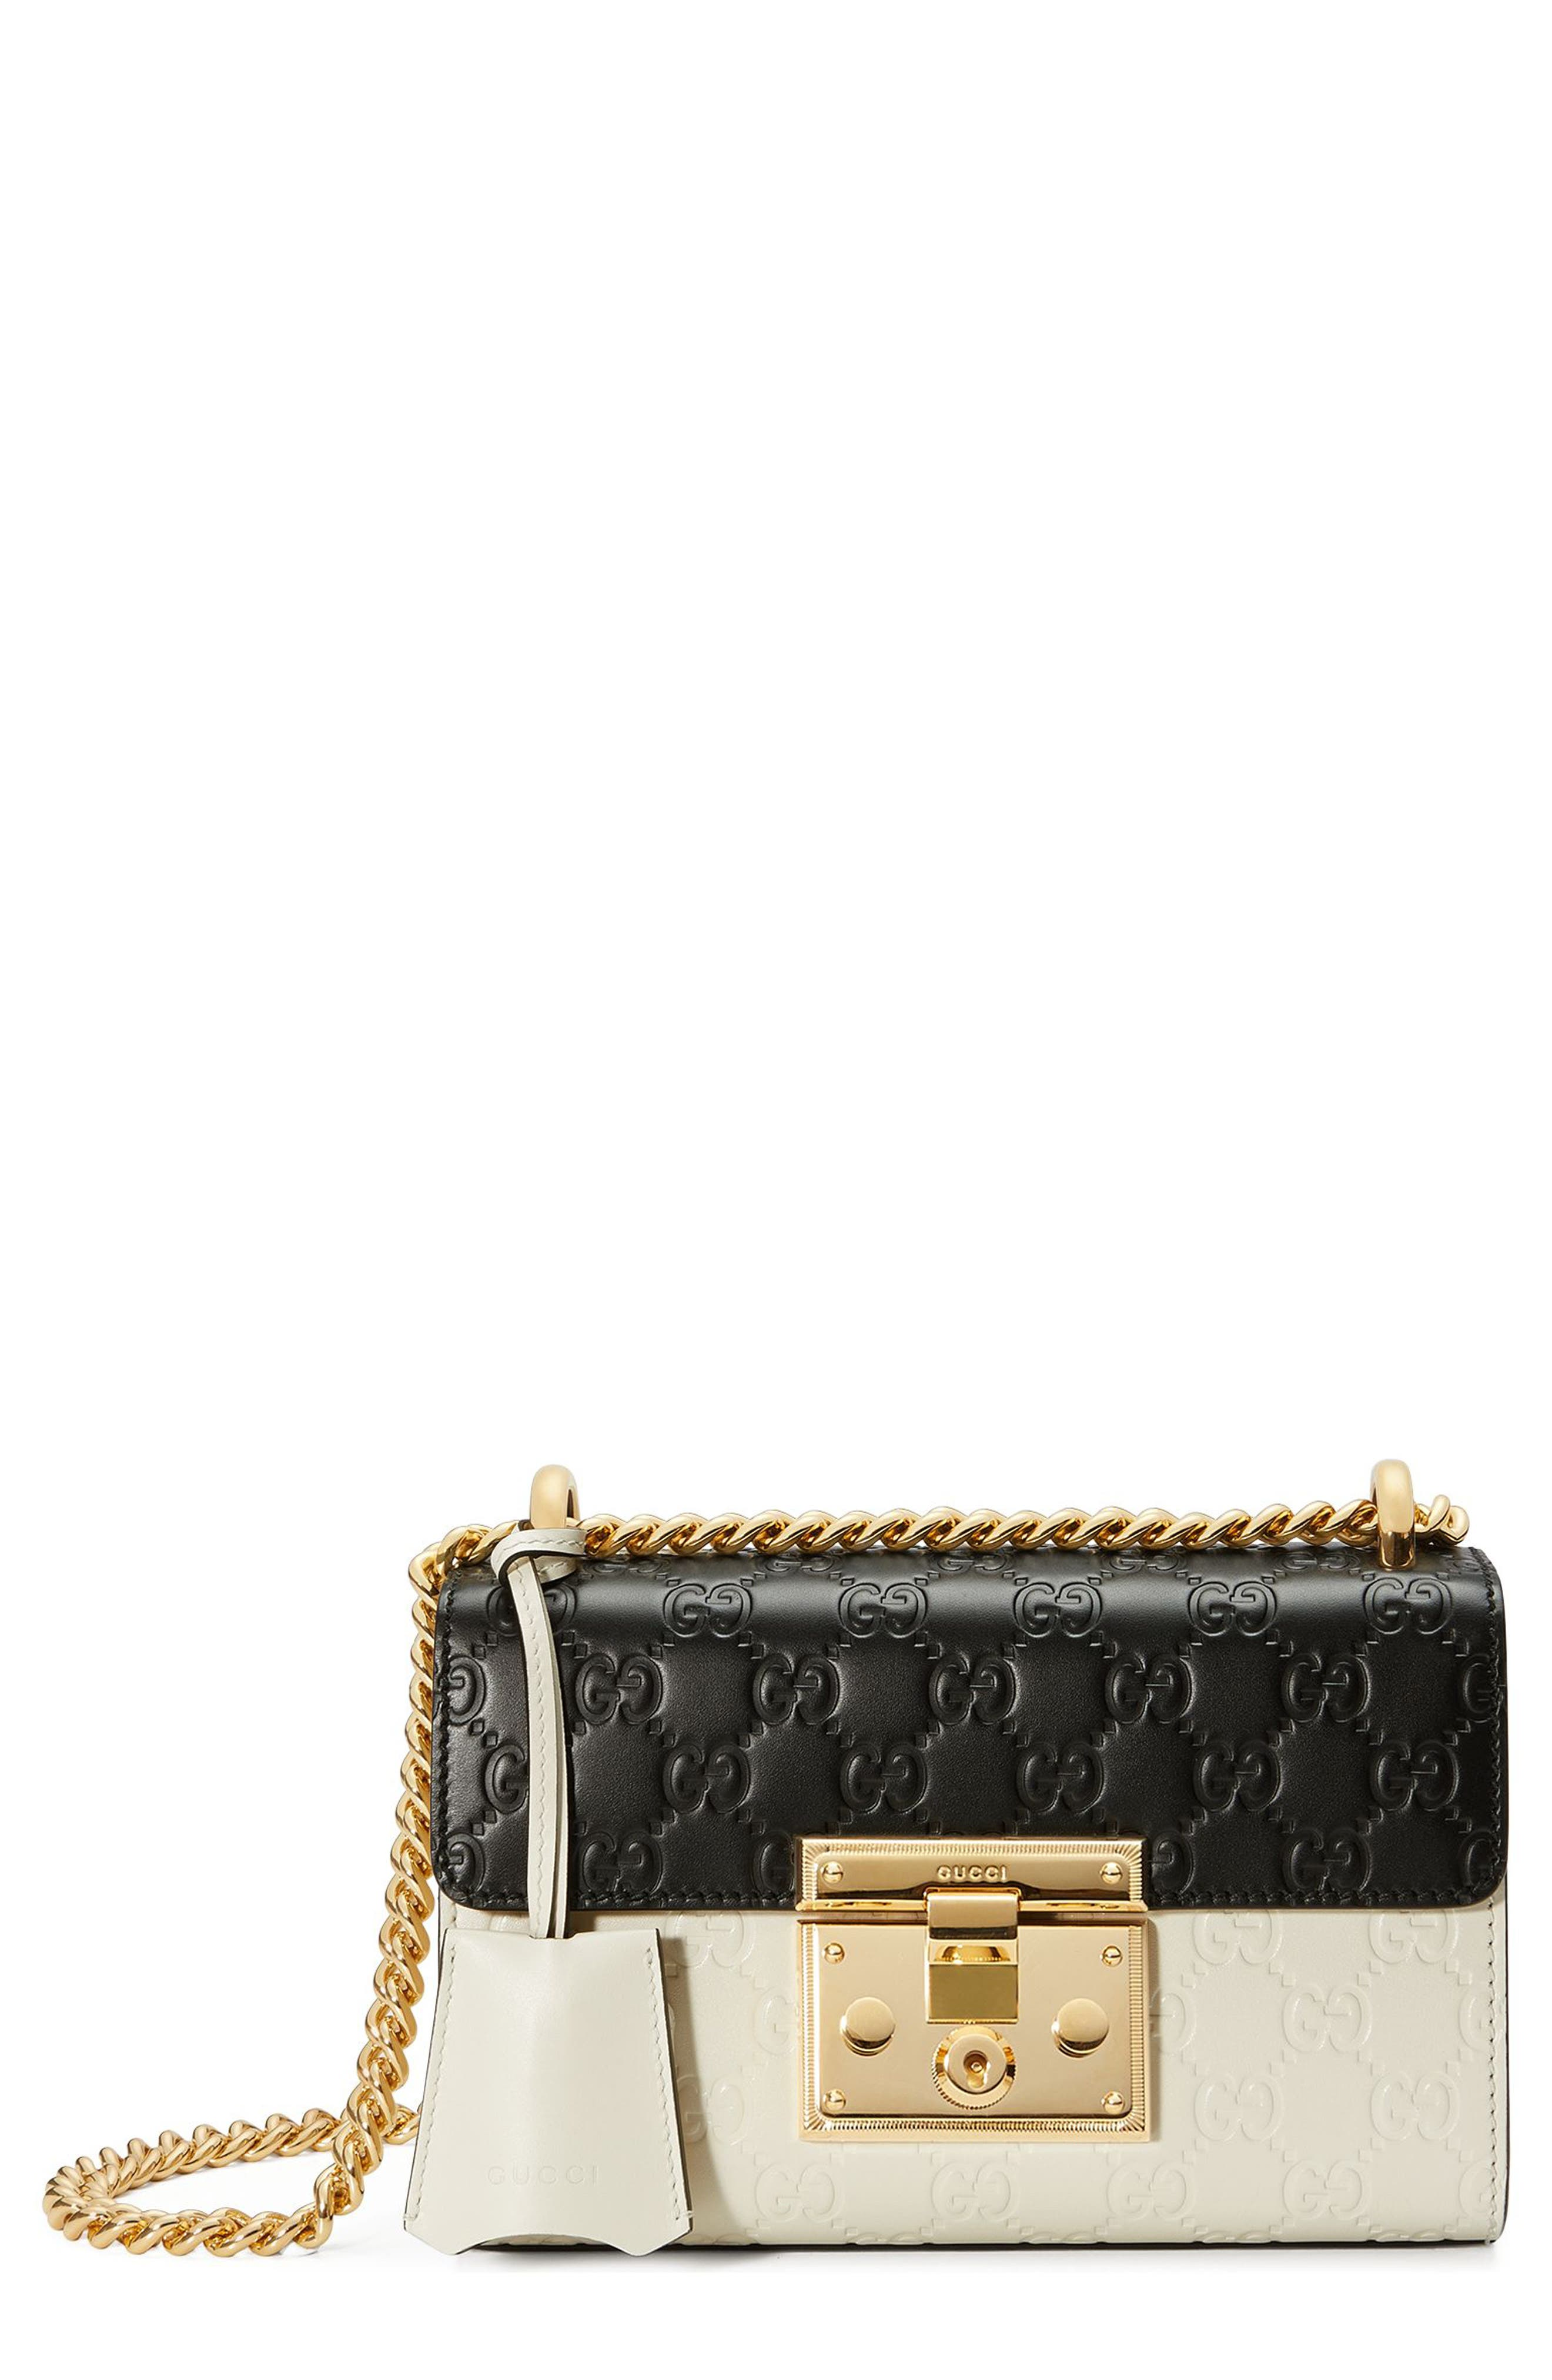 Gucci Small Padlock Signature Leather Shoulder Bag